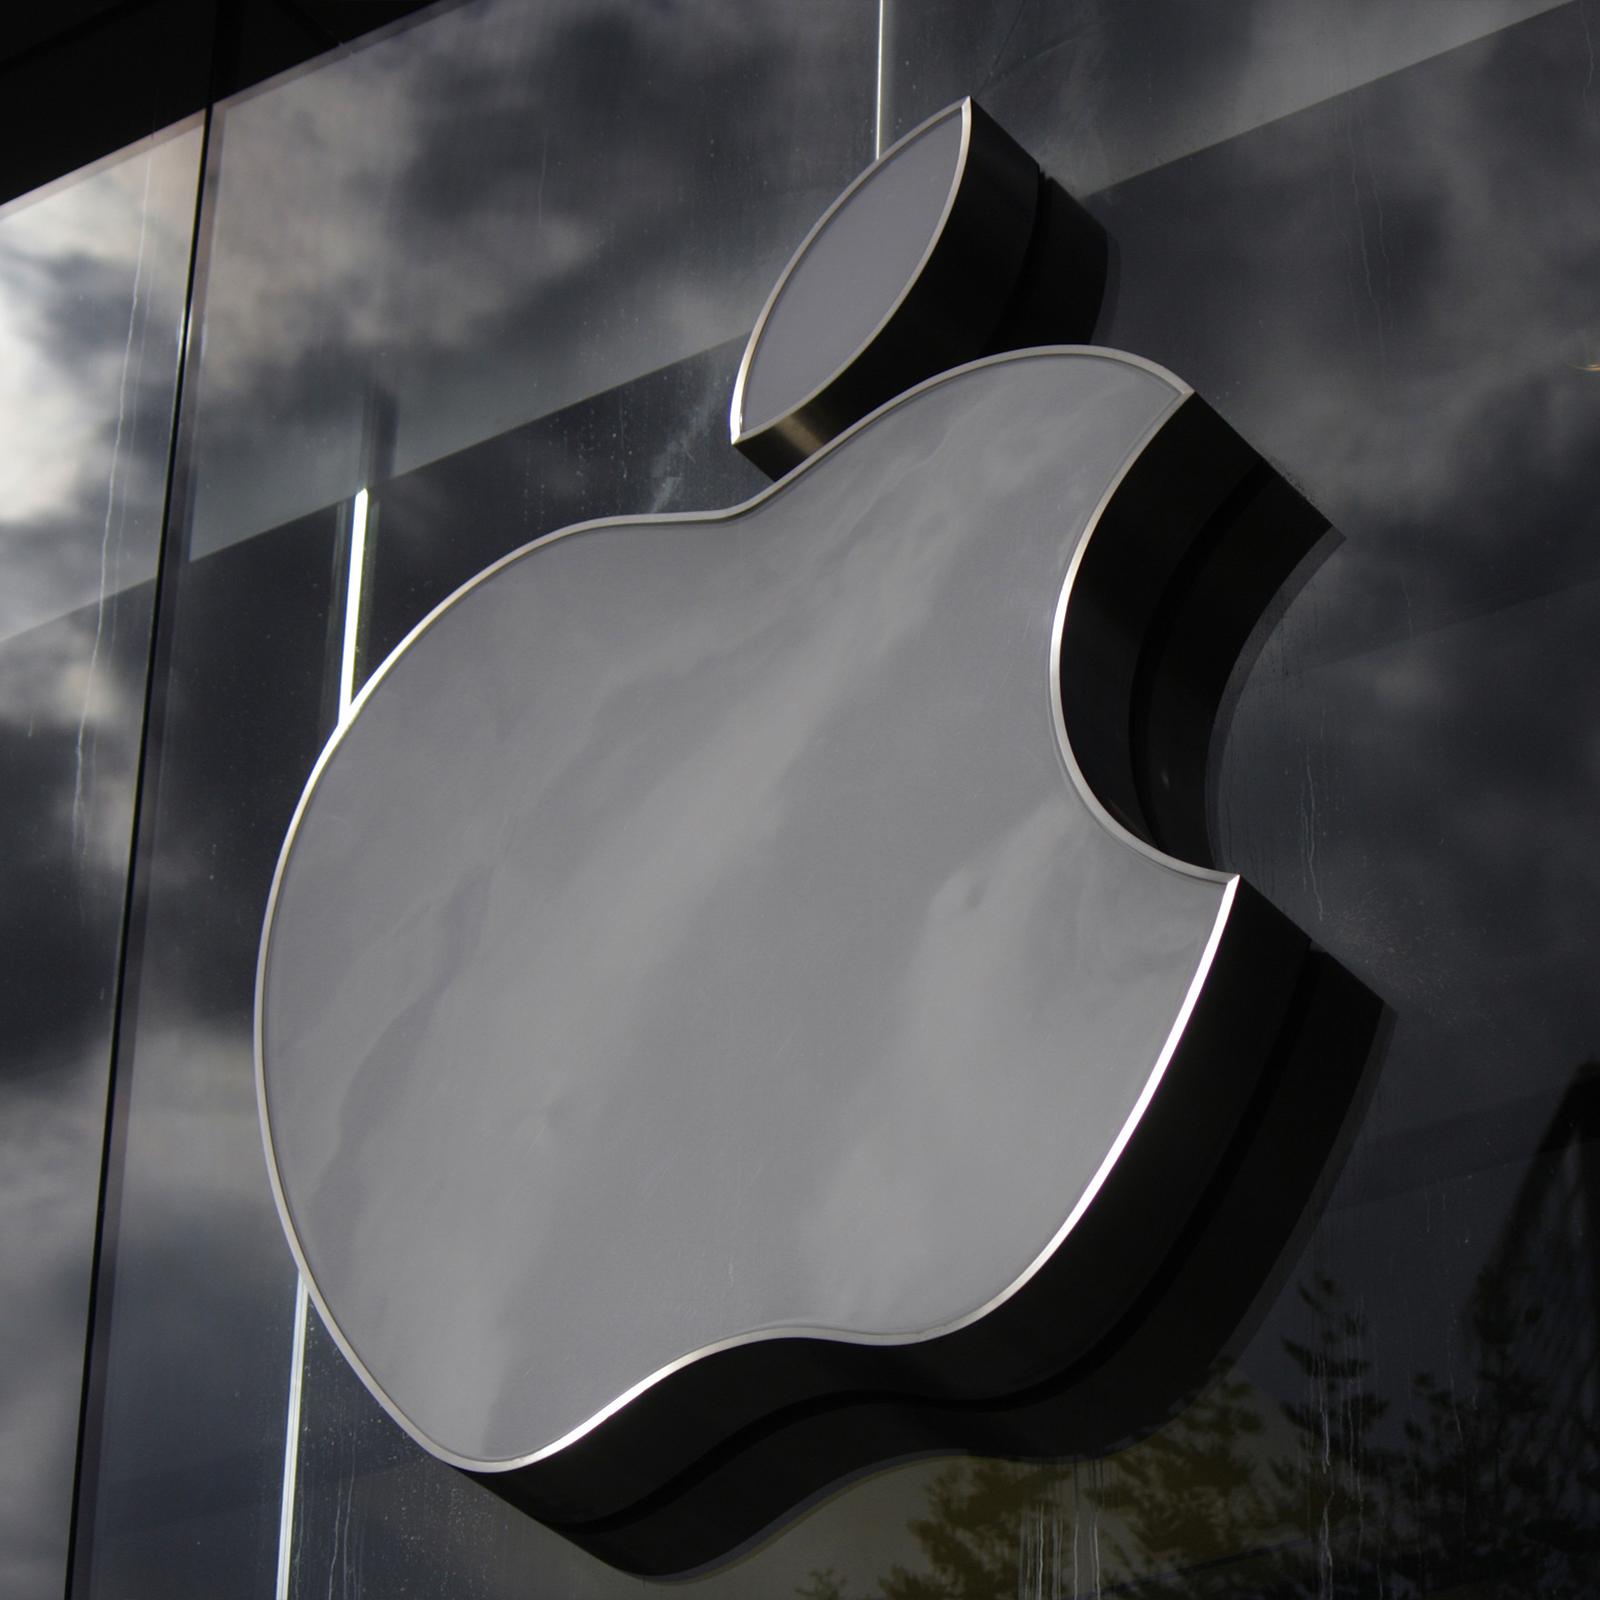 XcodeGhost malware compromises legitimate iOS apps | Kaspersky